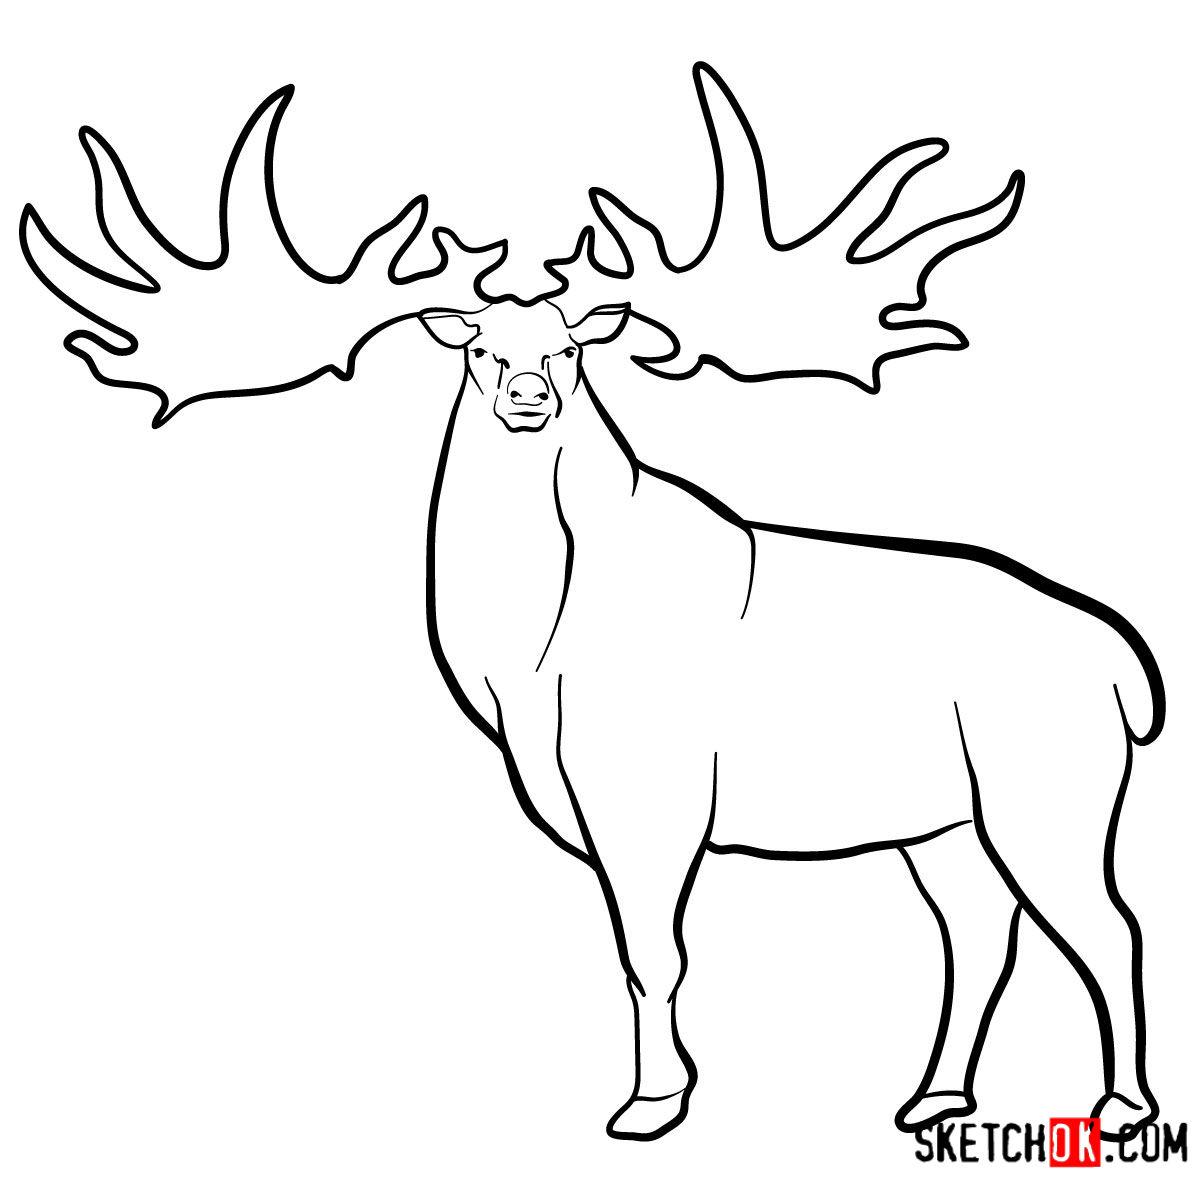 How to draw an Irish elk